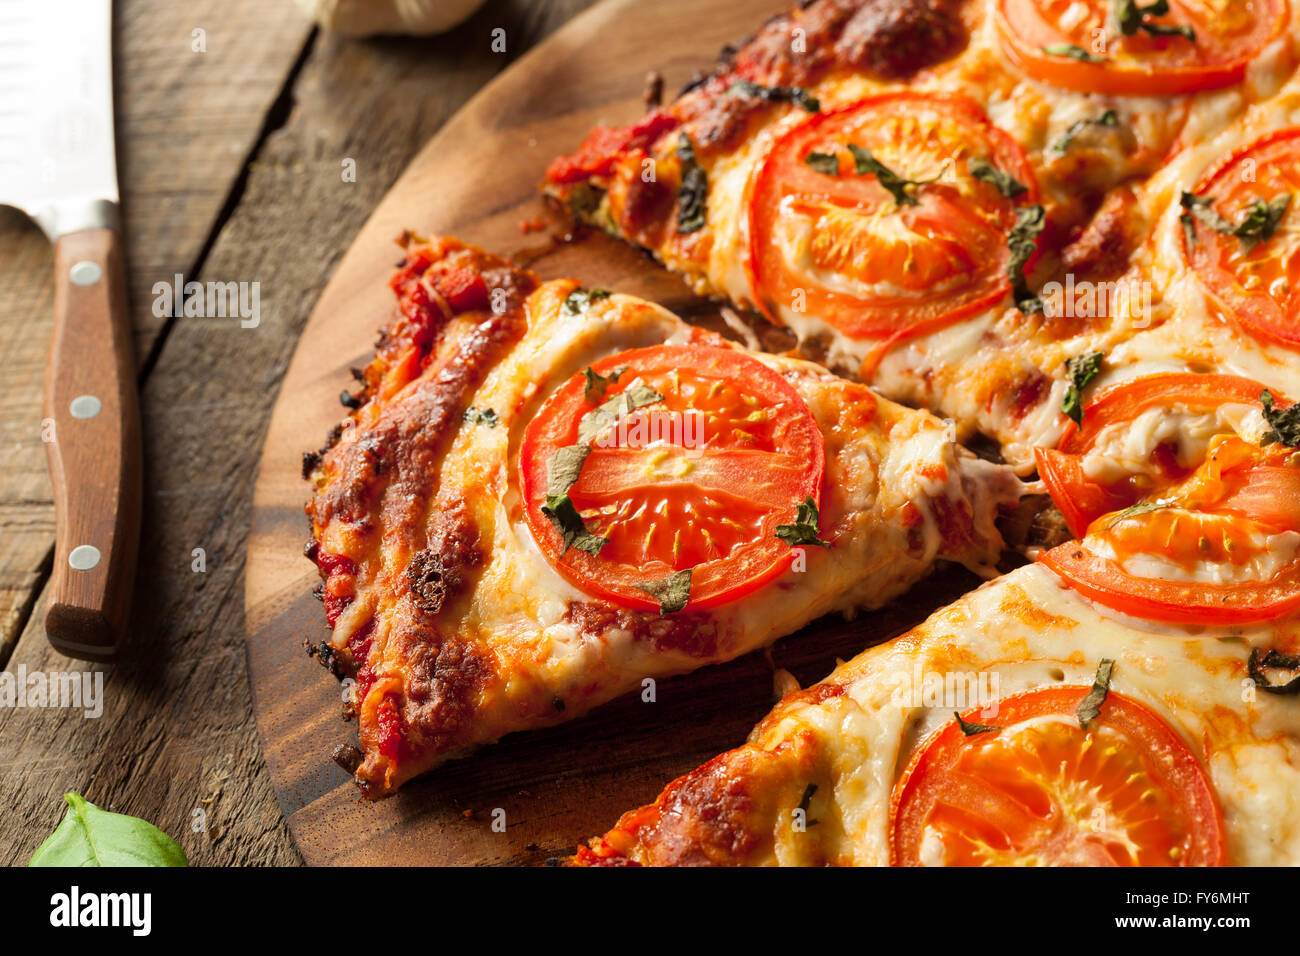 Homemade Vegan Cauliflower Crust Pizza with Tomato and Basil - Stock Image